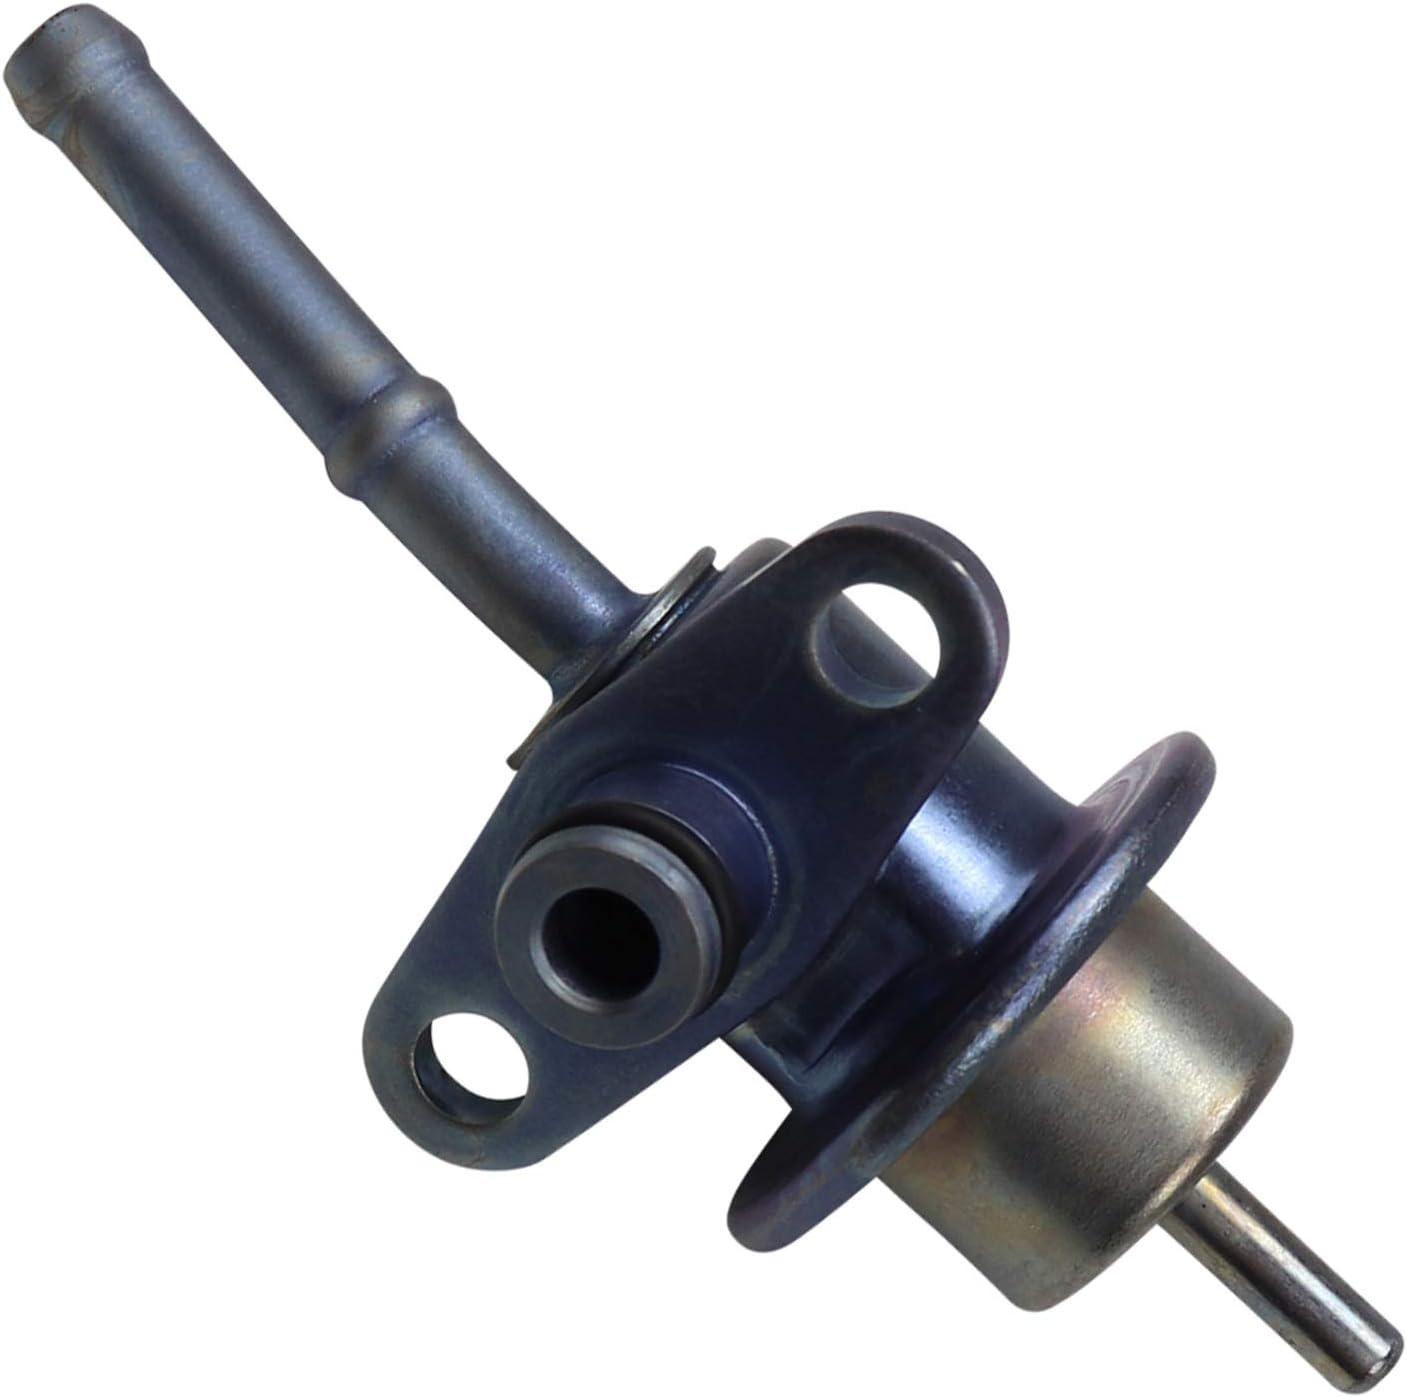 Oakland Mall Beck Arnley 158-0259 Fuel Max 89% OFF Injection Pressure Regulator